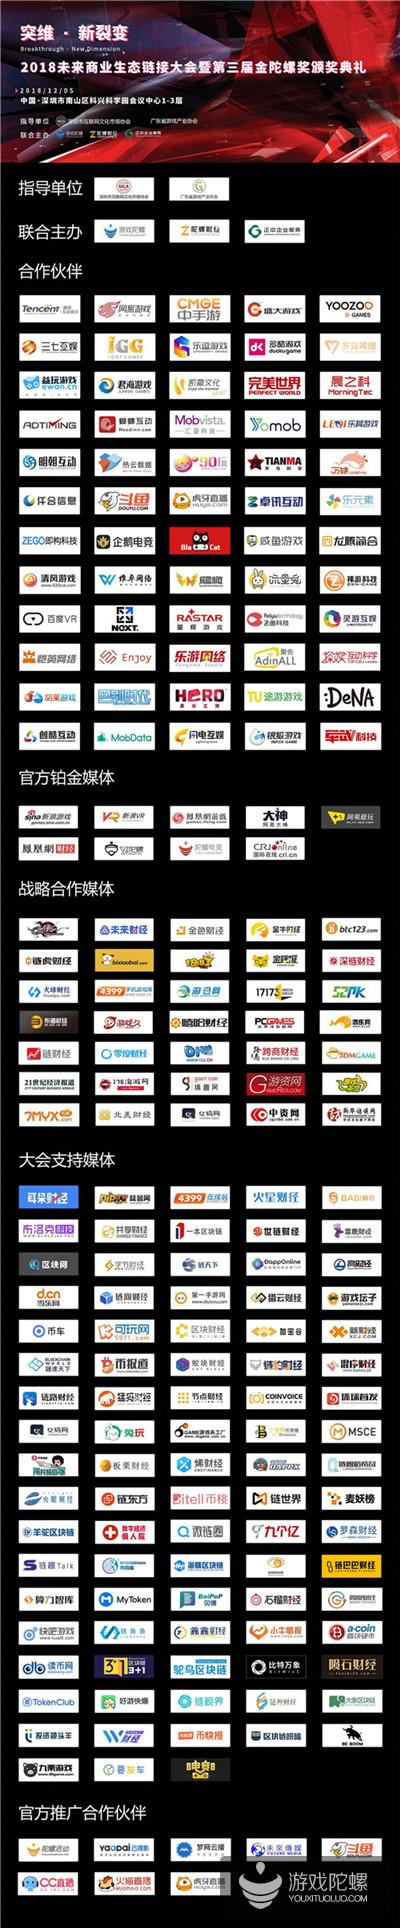 FBEC2018专访|Efun总经理特助沈忱:中小型厂商是否还有出海空间?